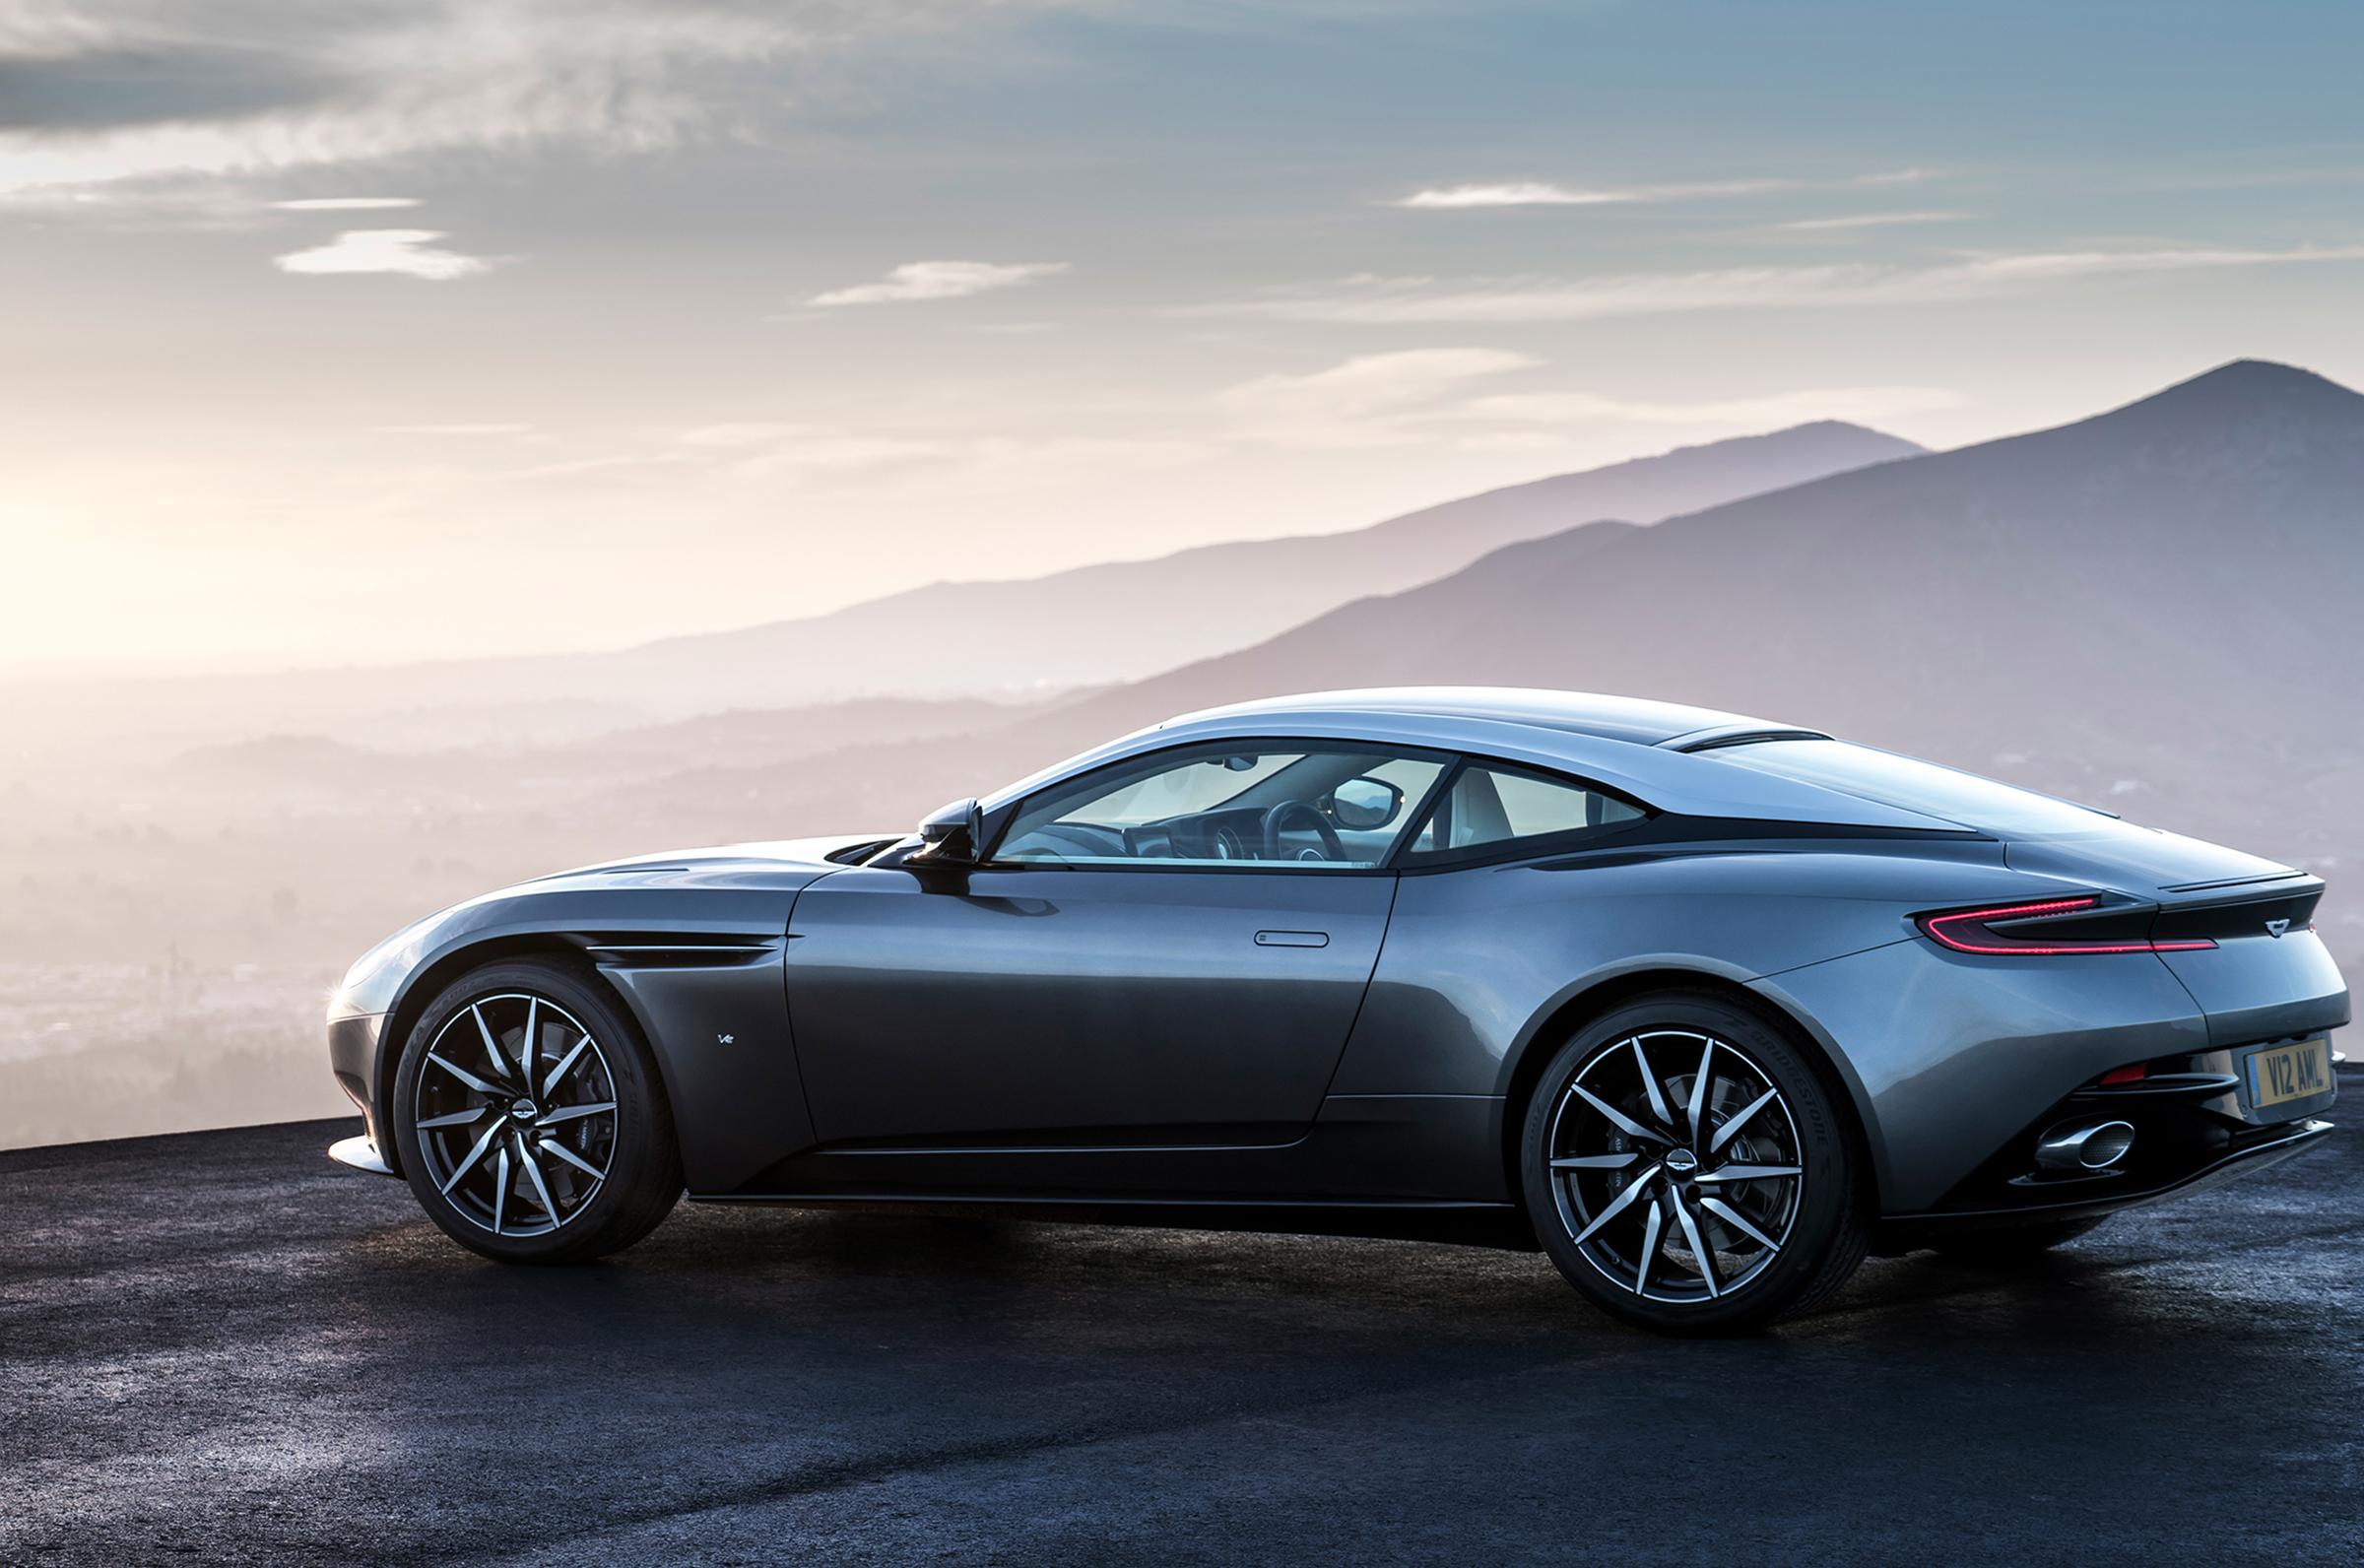 Db11 Aston Martin The Americas